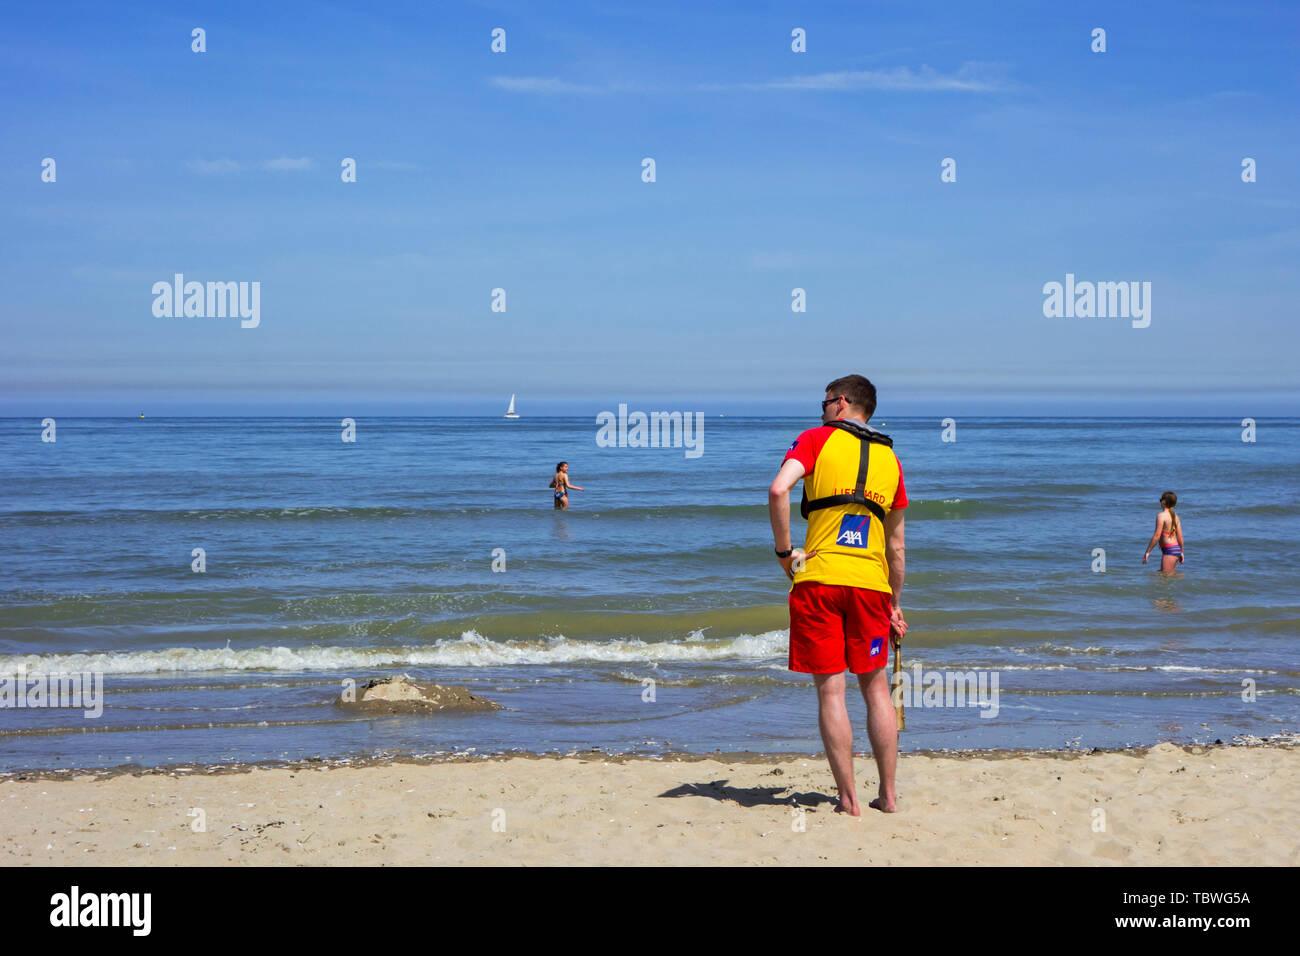 Beach lifeguard supervising bathers at seaside resort along the Belgian North Sea coast, Belgium - Stock Image